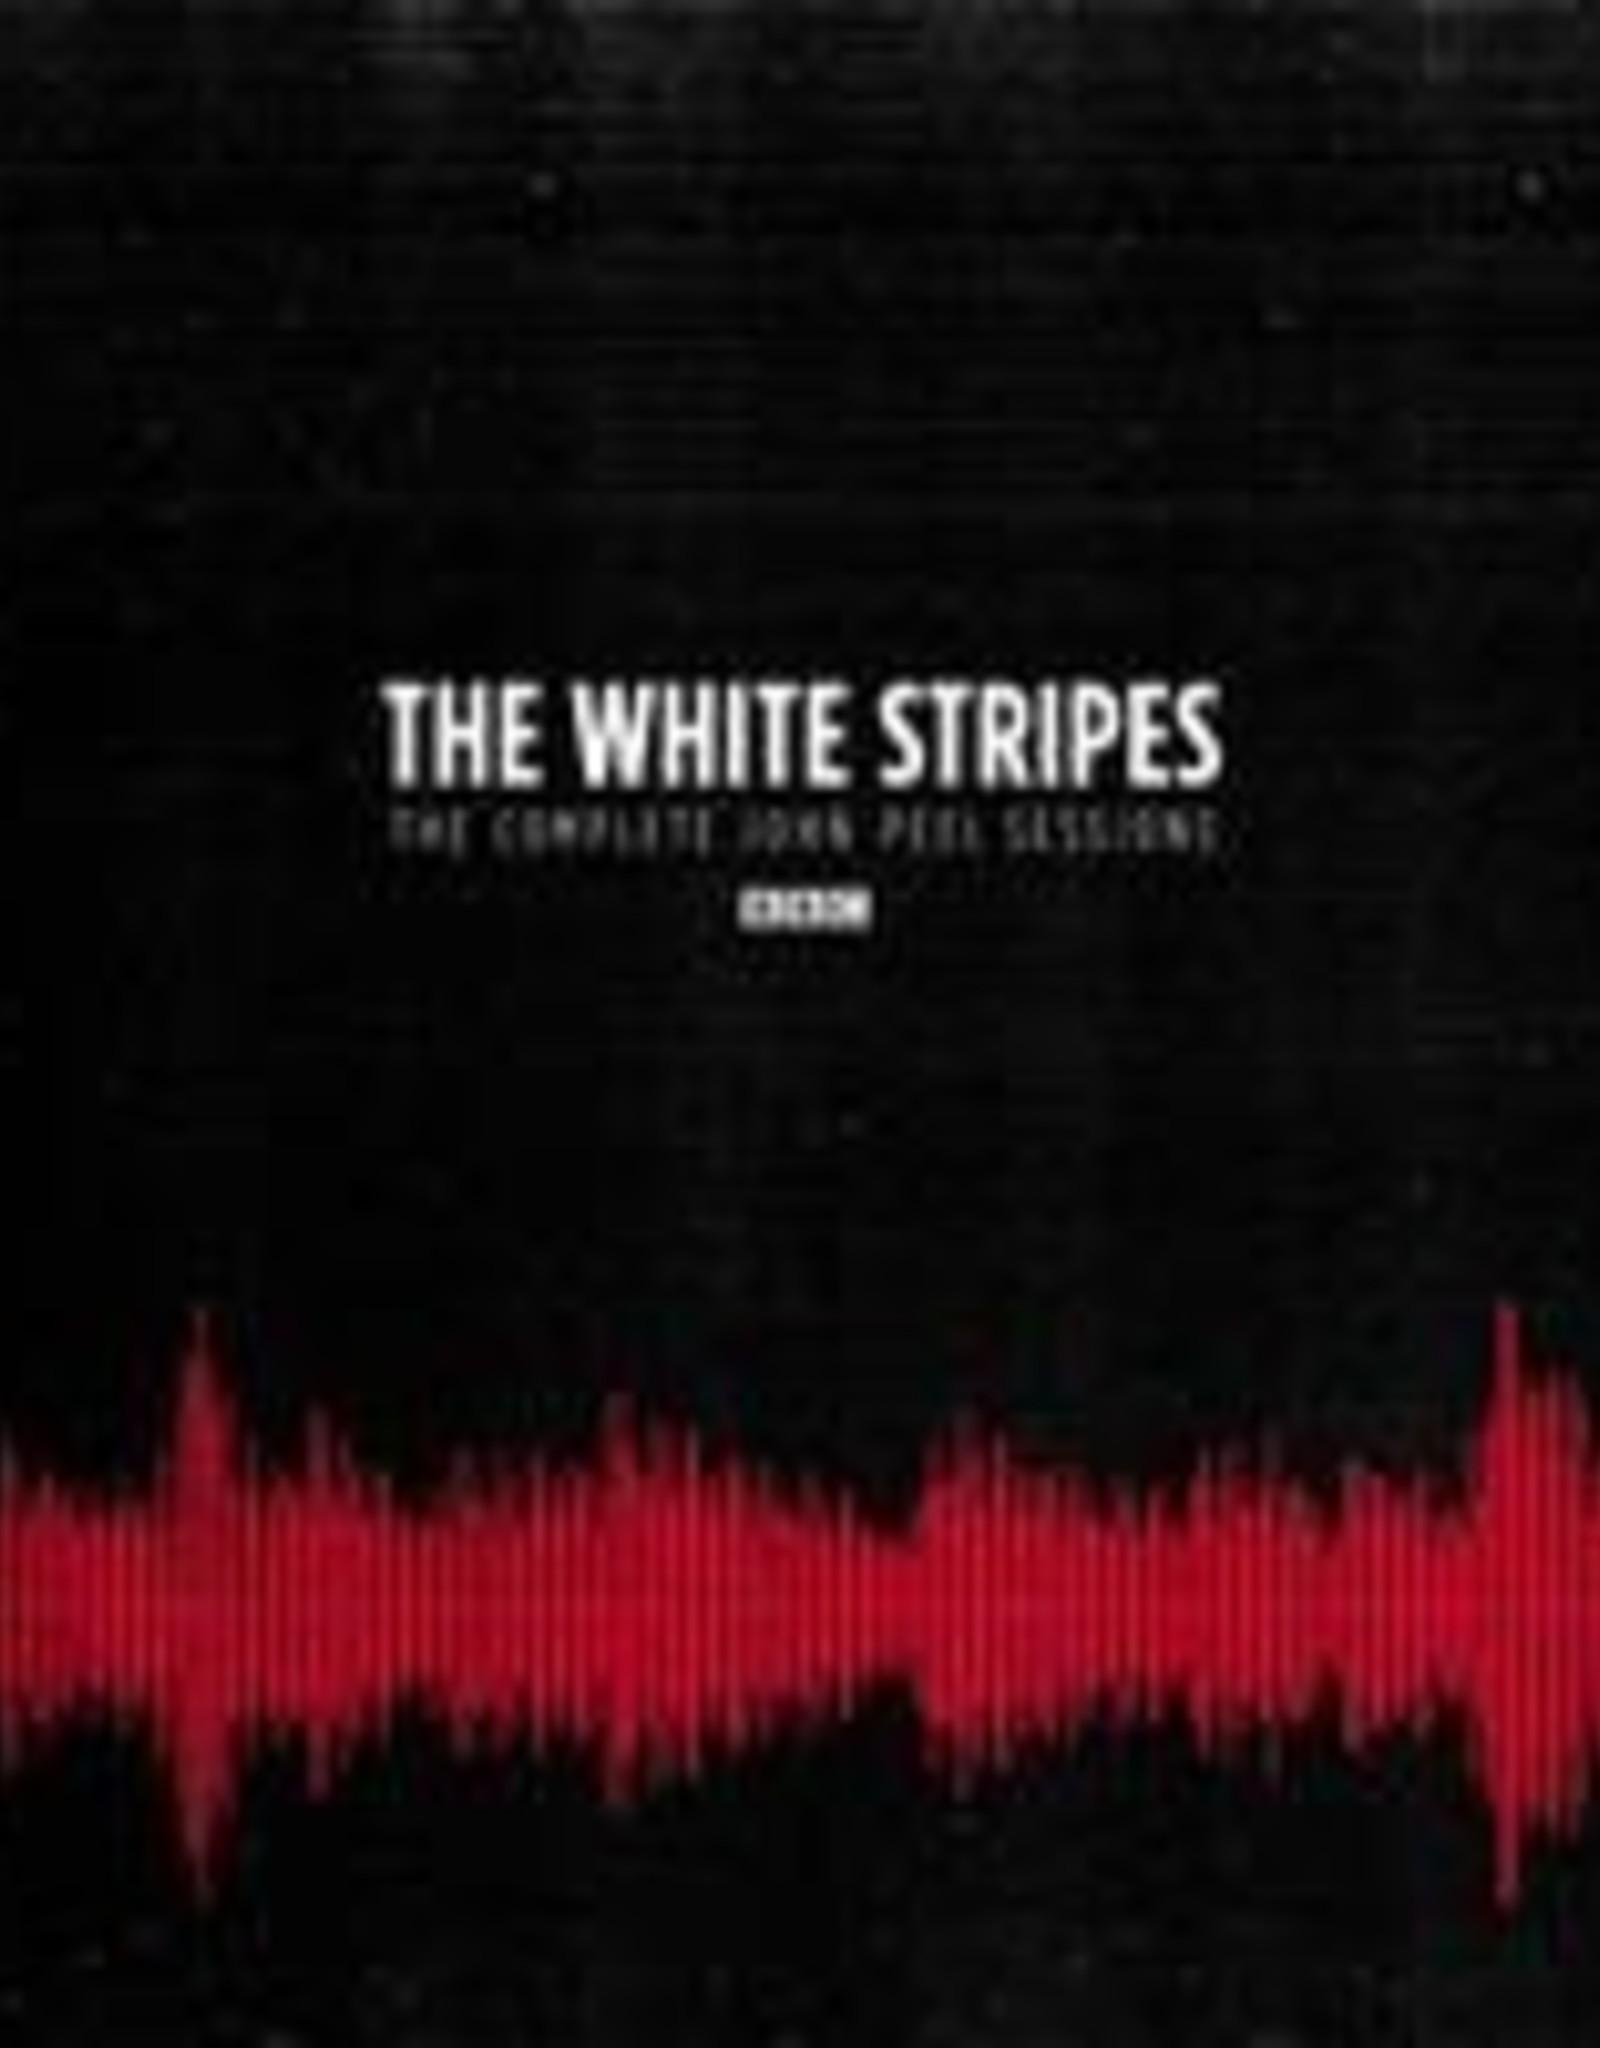 The White Stripes - The Complete John Peel Sessions (Black Vinyl Double Lp)